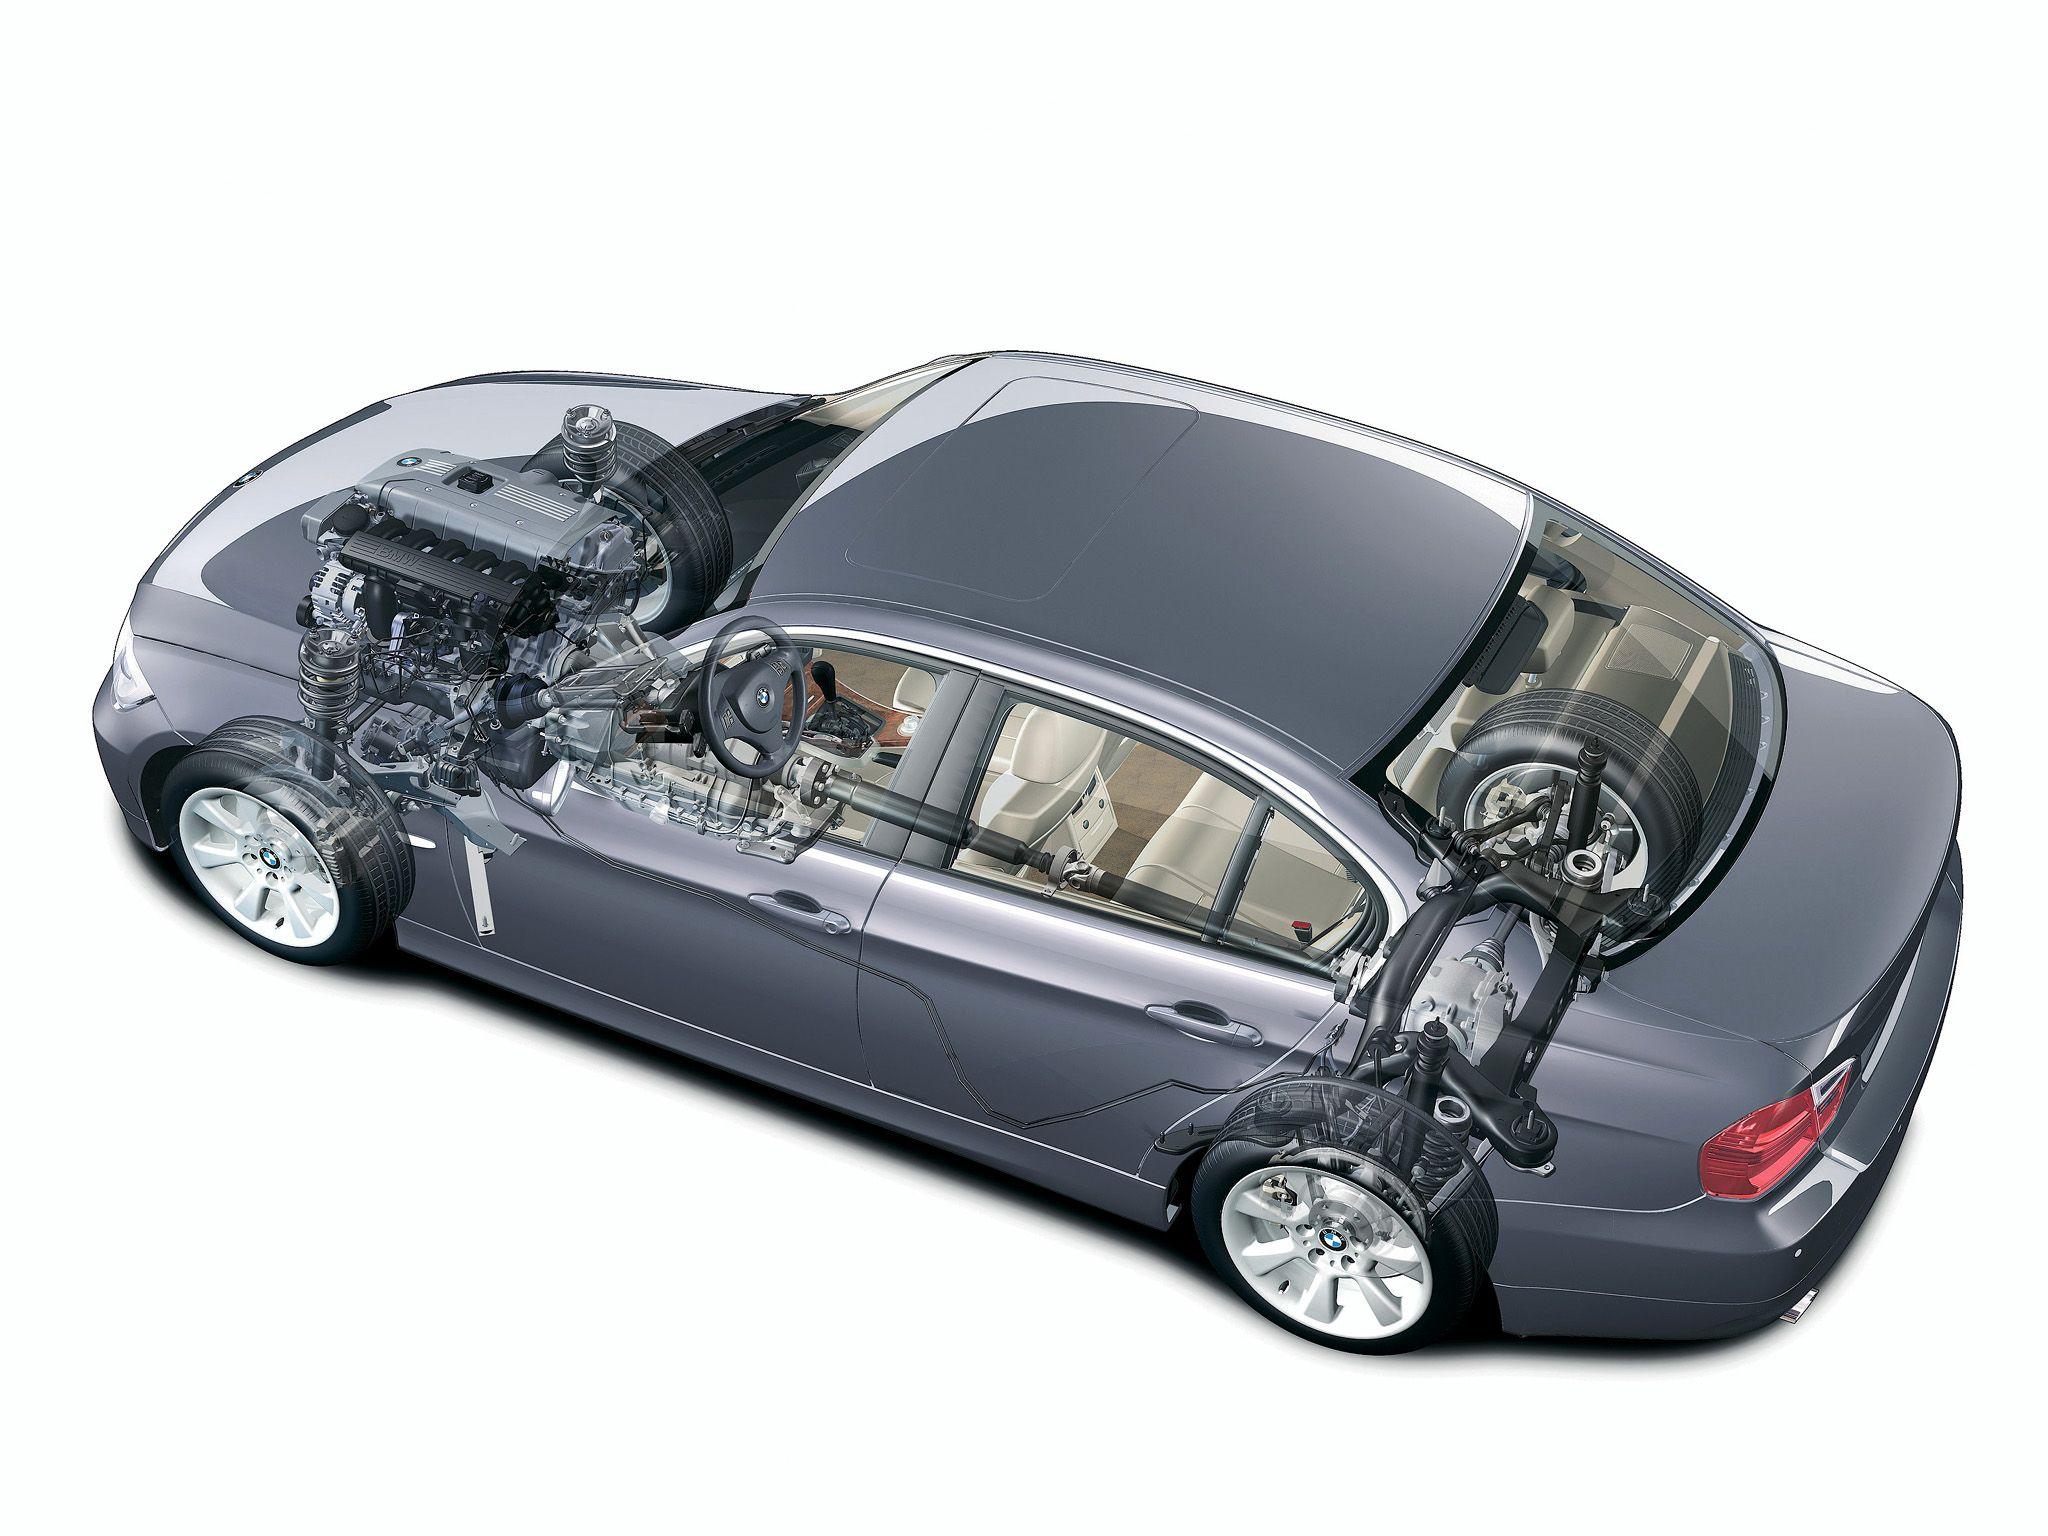 2005 2008 BMW 325i Sedan E90 Illustration unattributed